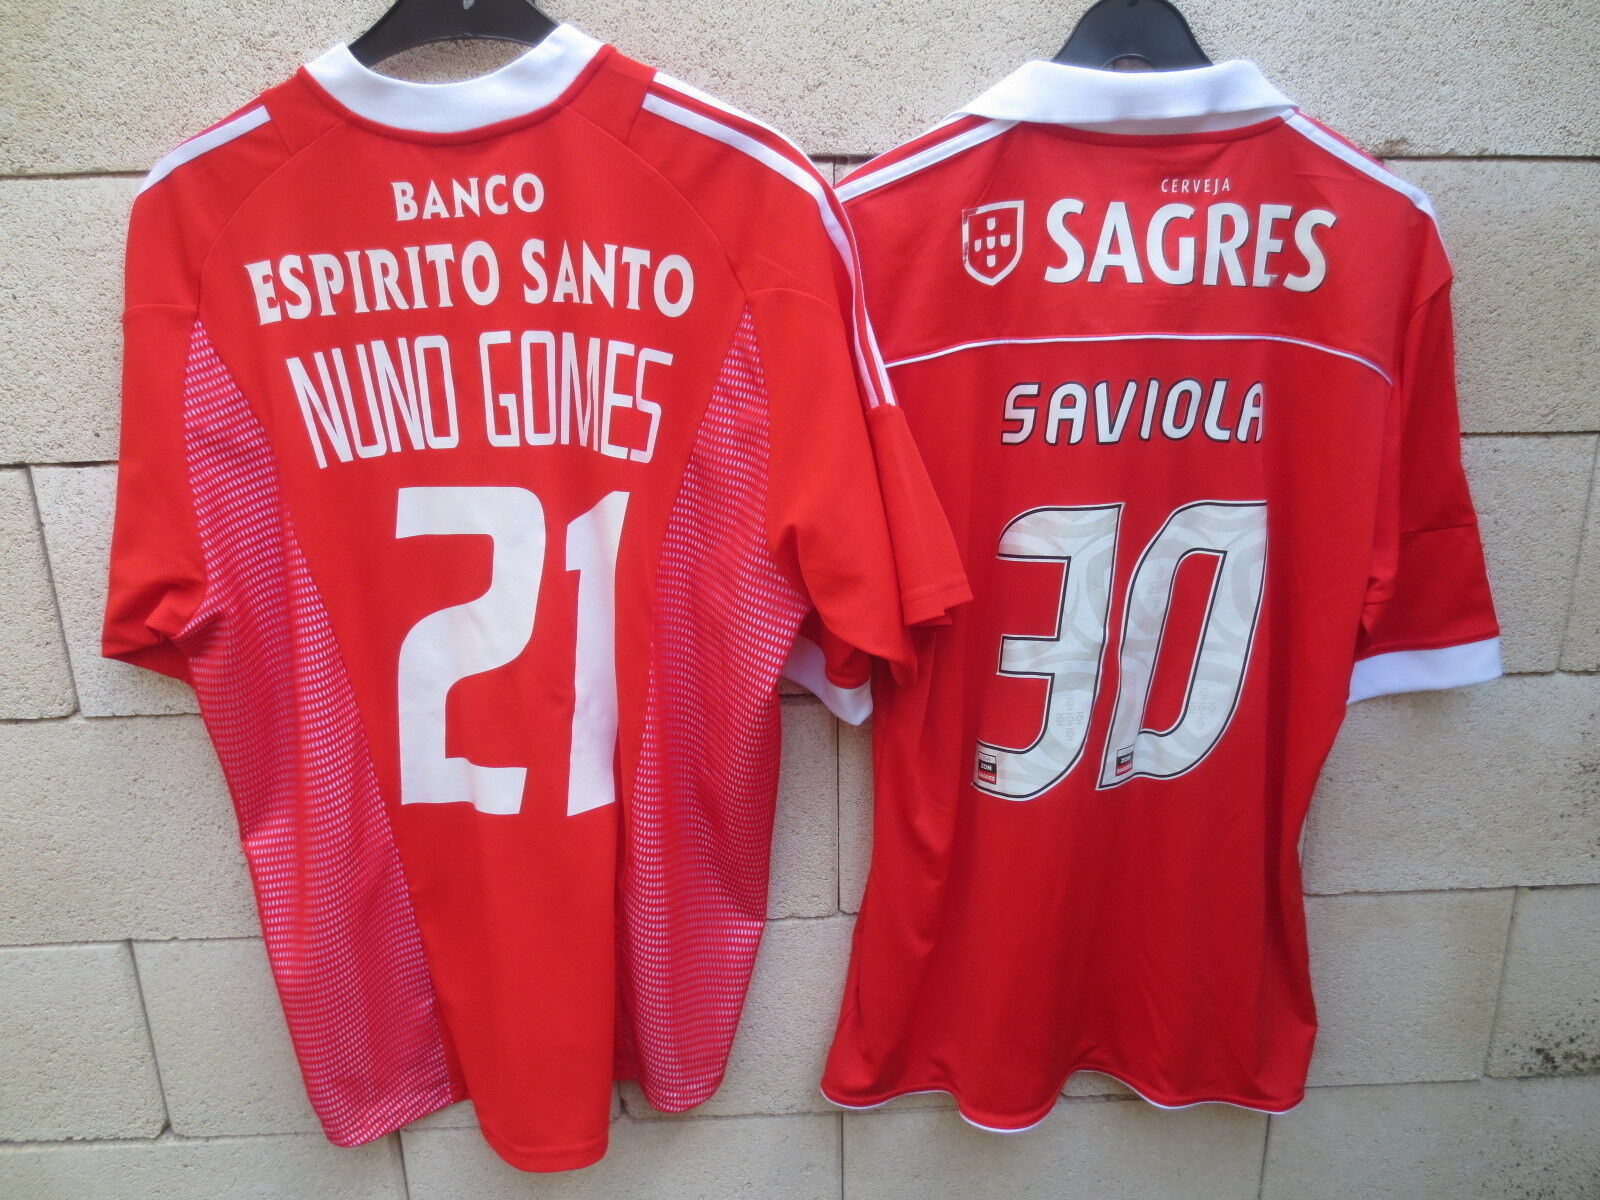 Lot 2 Maillot BENFICA jersey shirt ADIDAS NUNOS GOMES SApurple Lisbonne football